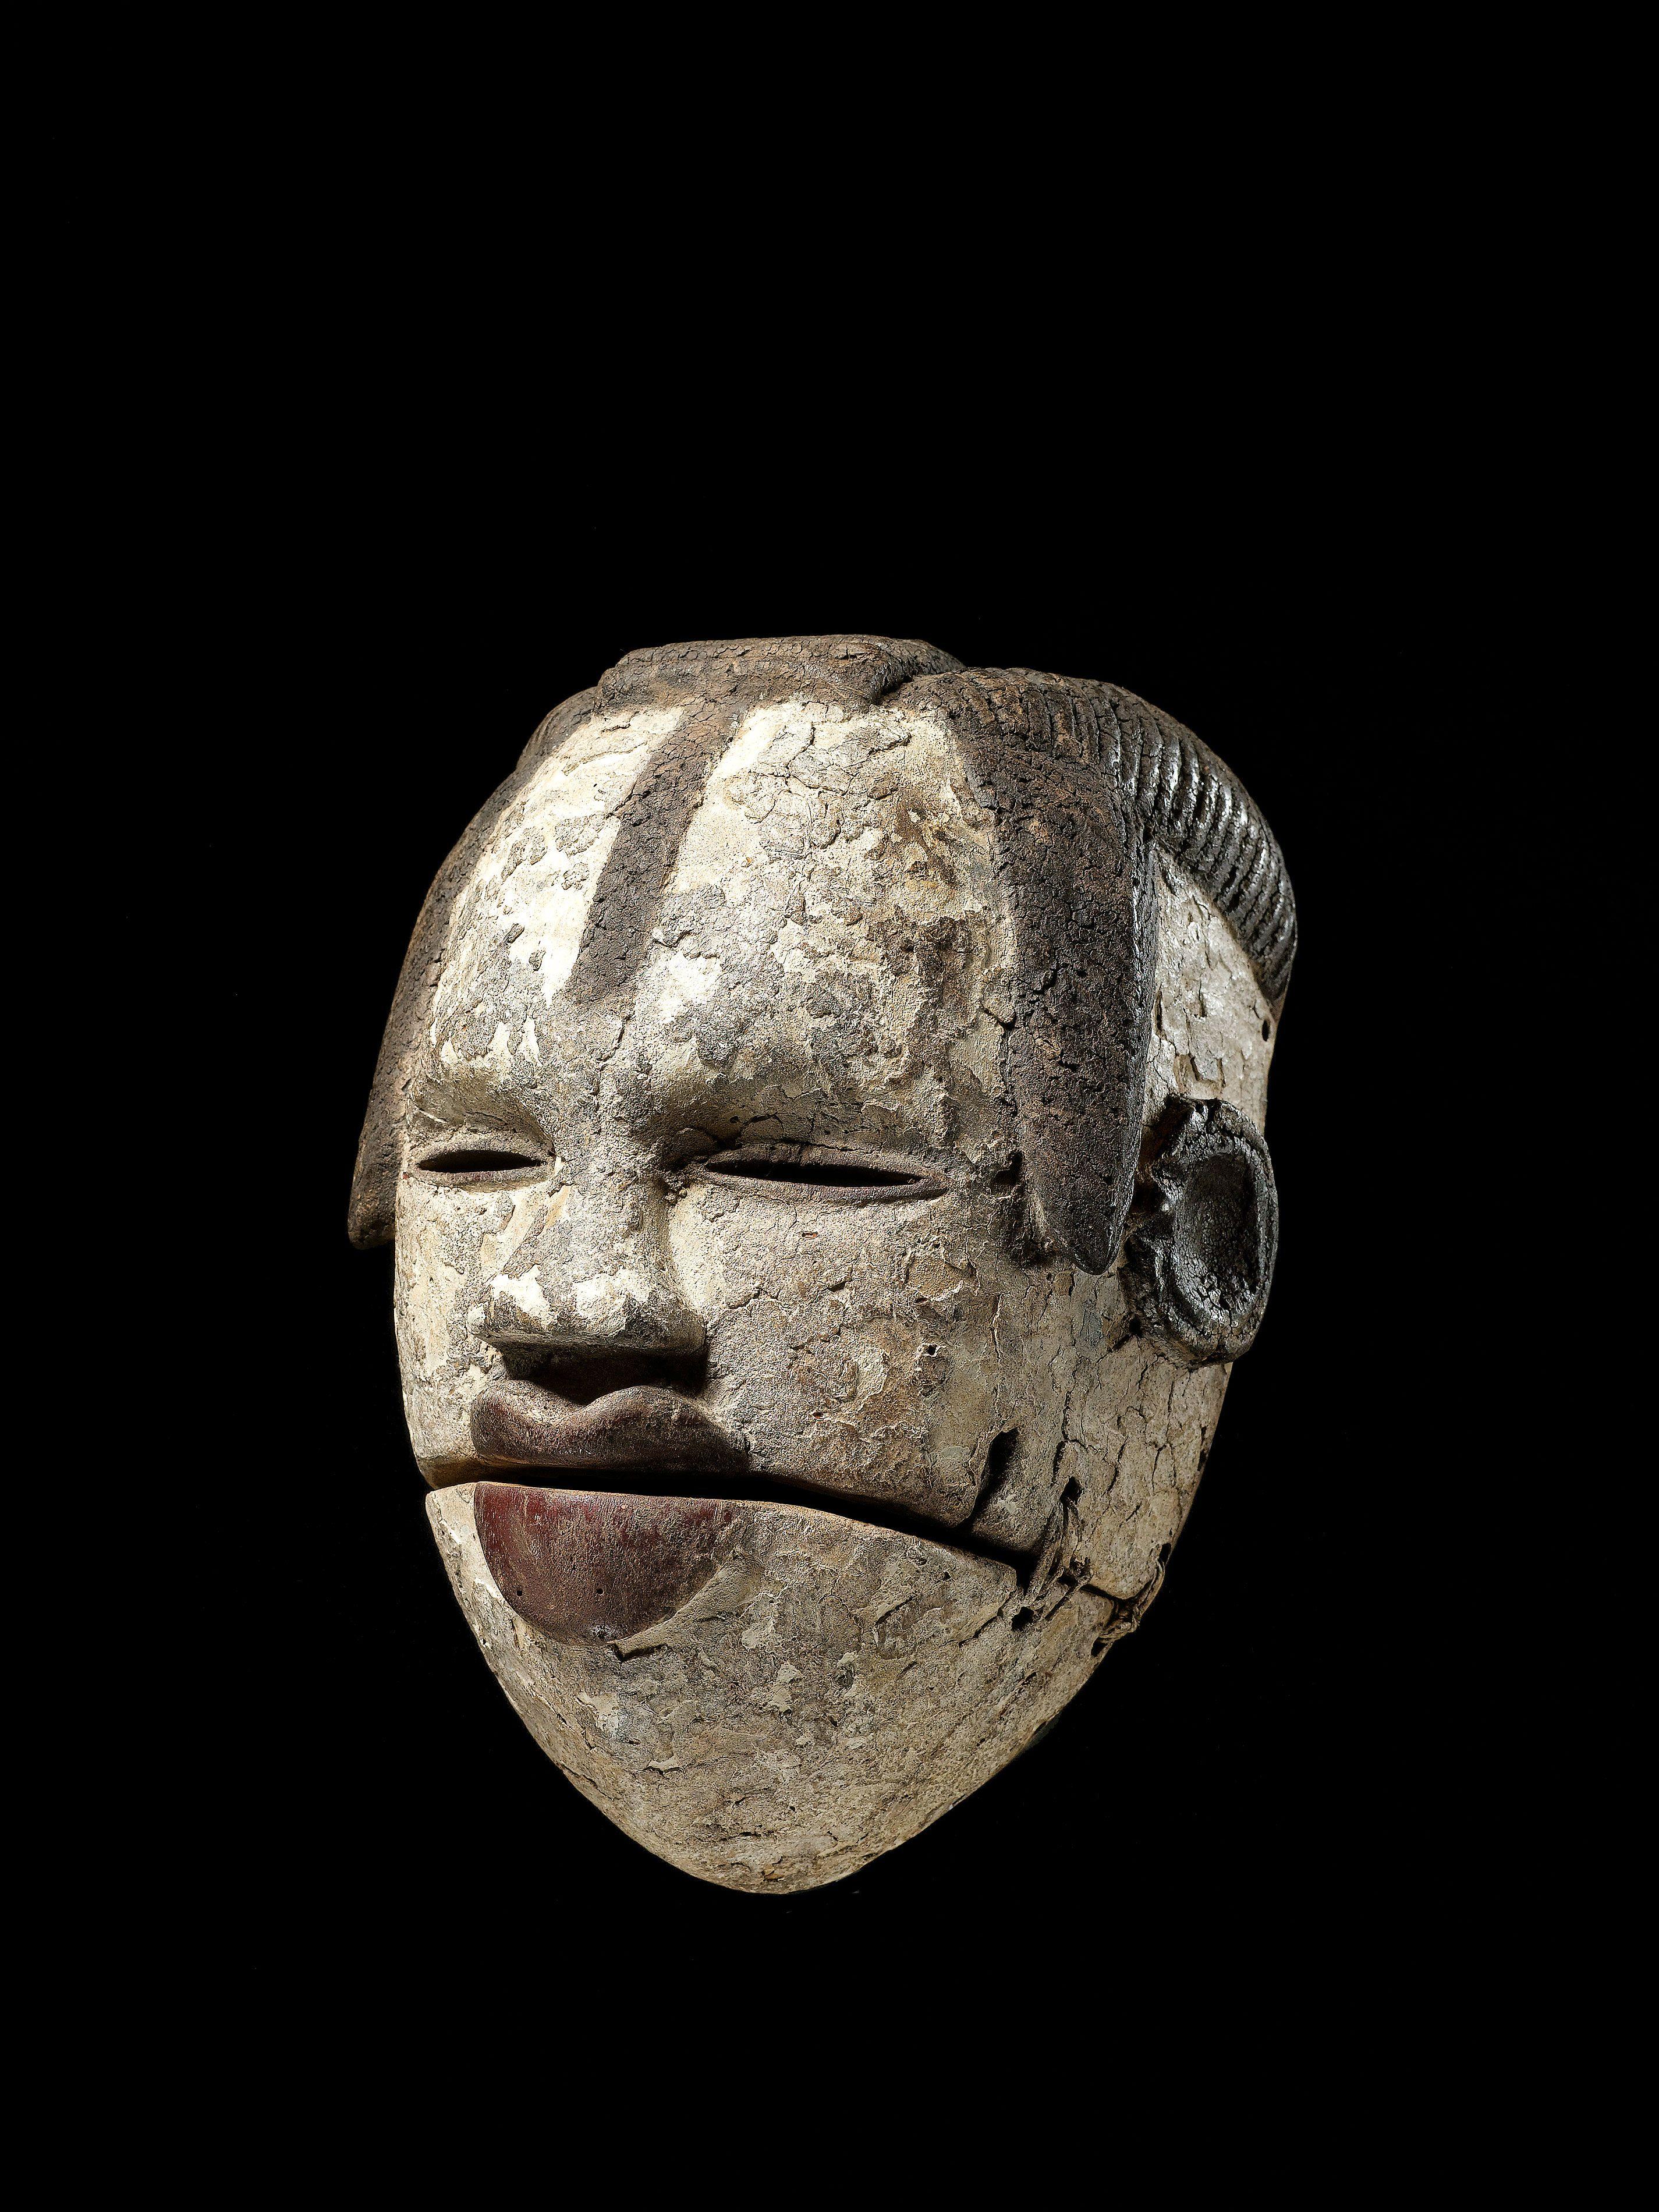 201 Pingl 233 Par Serge Trullu Sur Ogoni Masques Africains